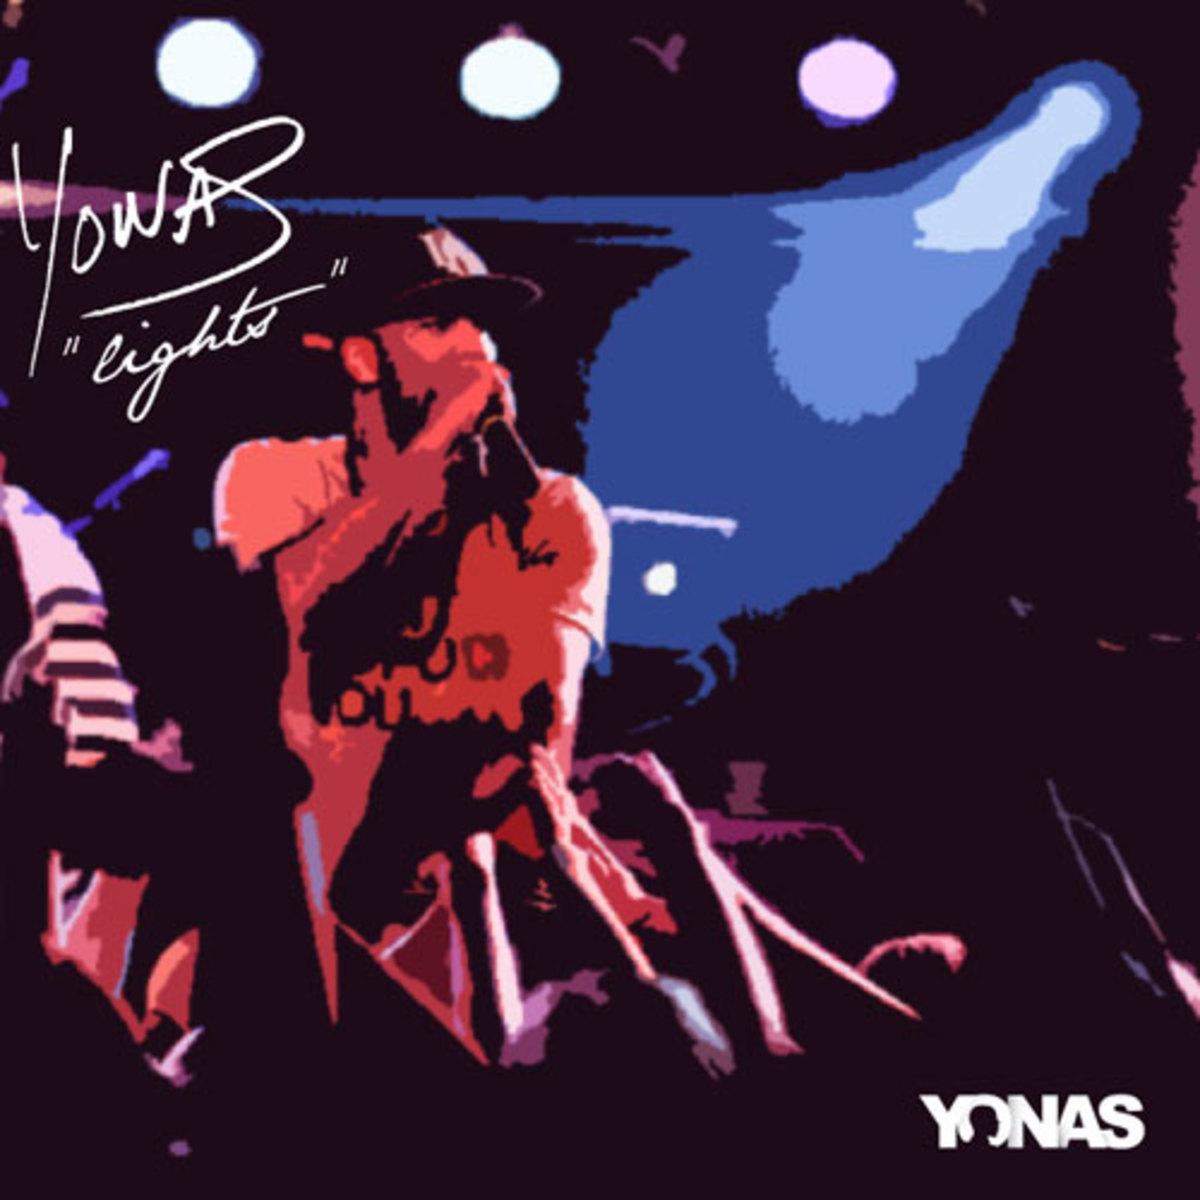 yonas-lightsrmx.jpg